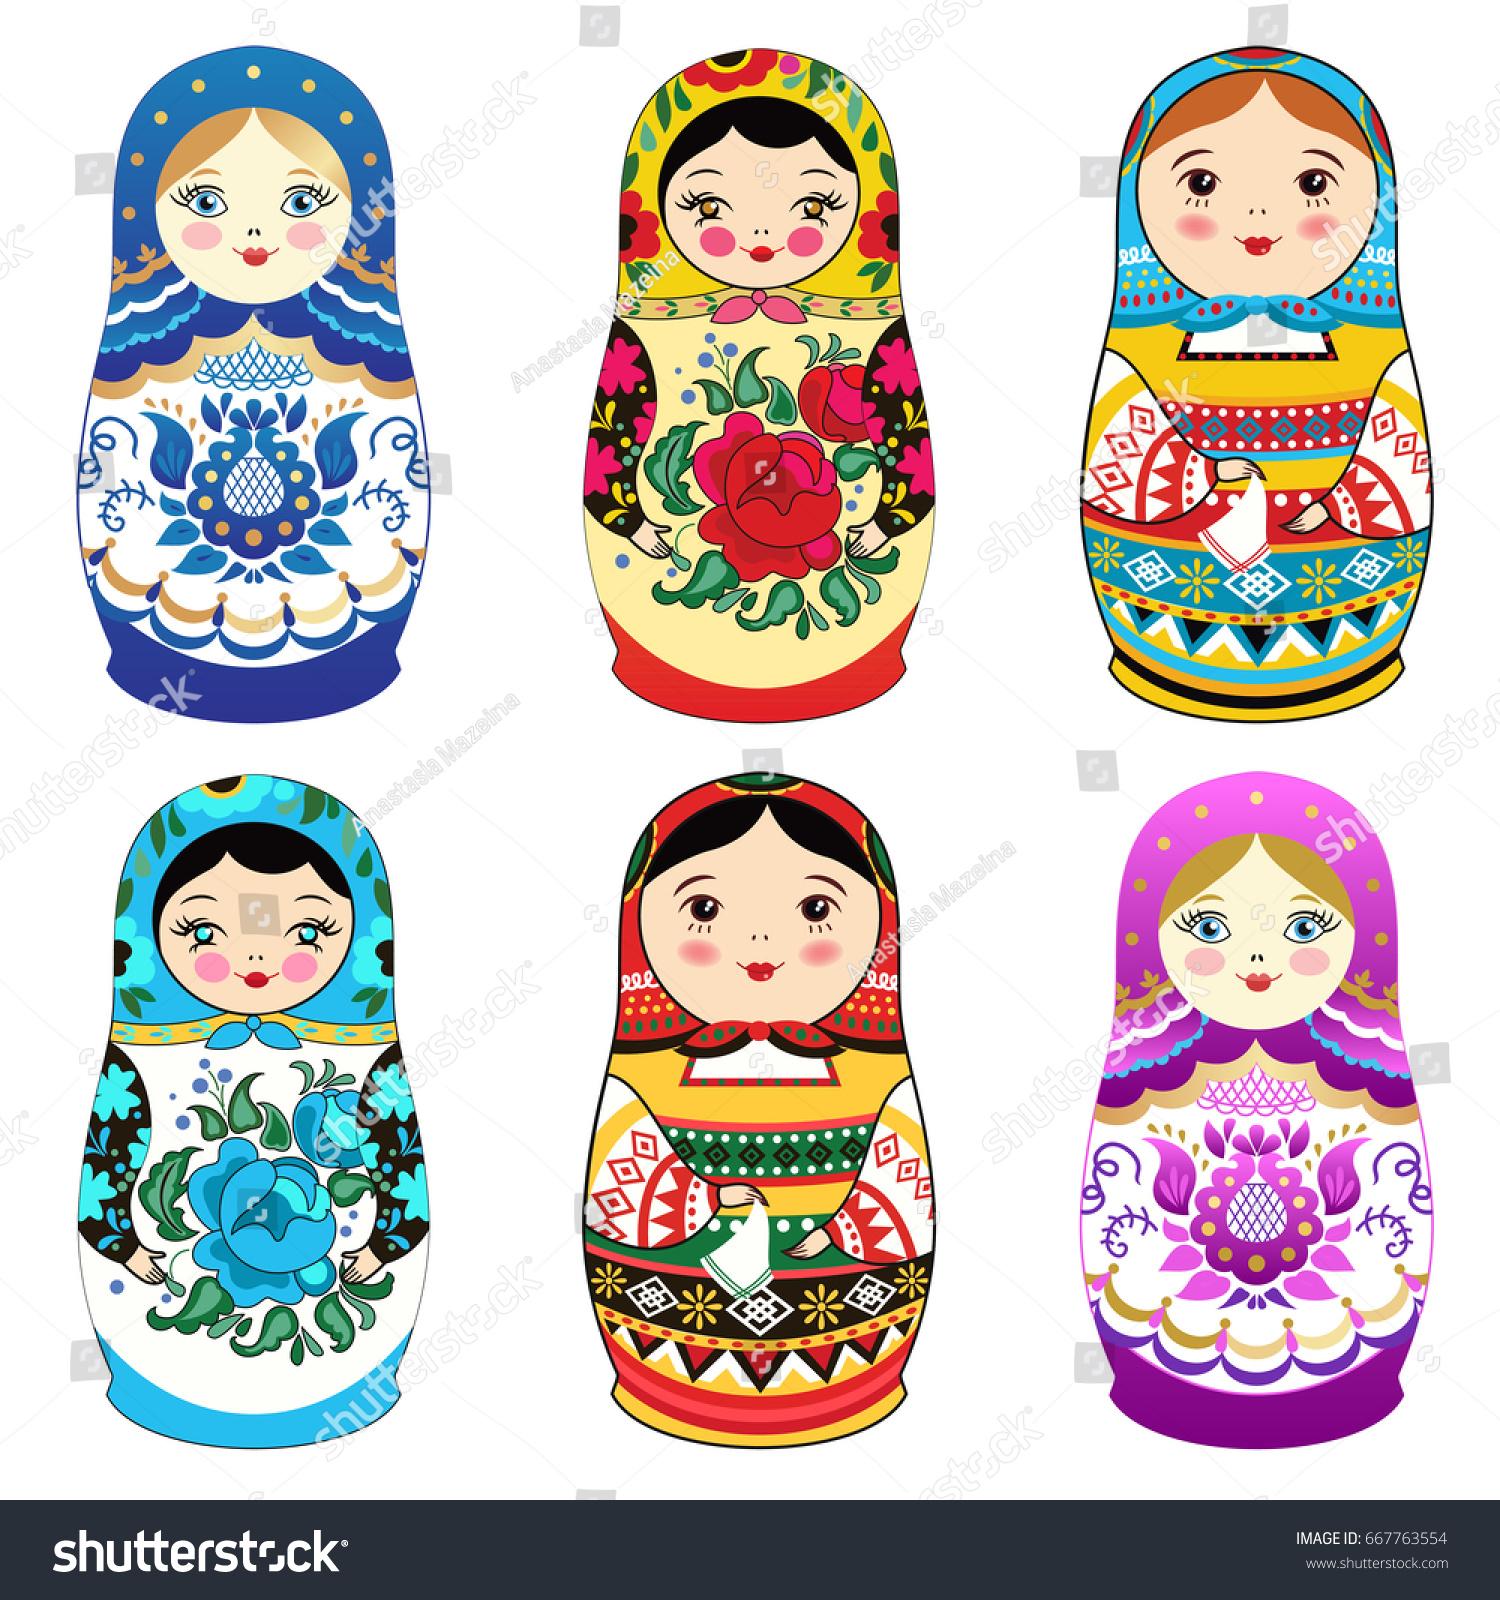 russian doll matrioshka smiling face pink stock vector 667763554